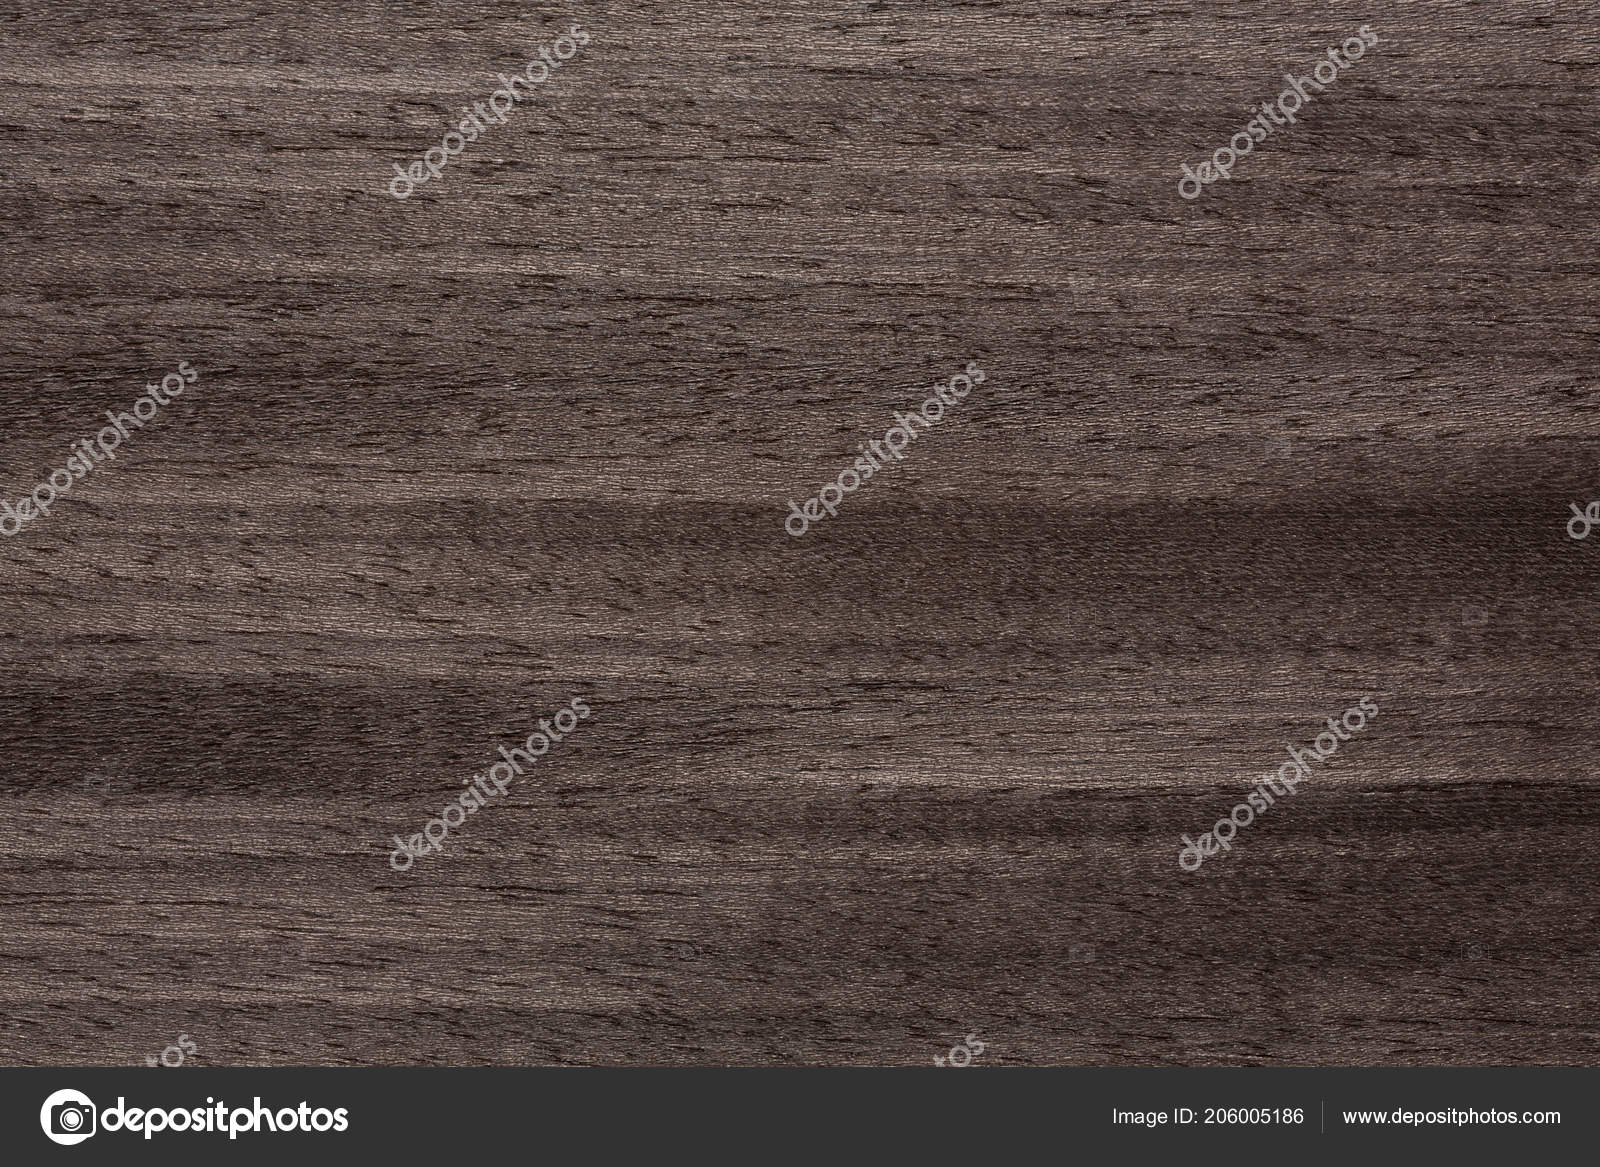 Clear Cut Wooden Veneer Texture Superior Grey Tone High